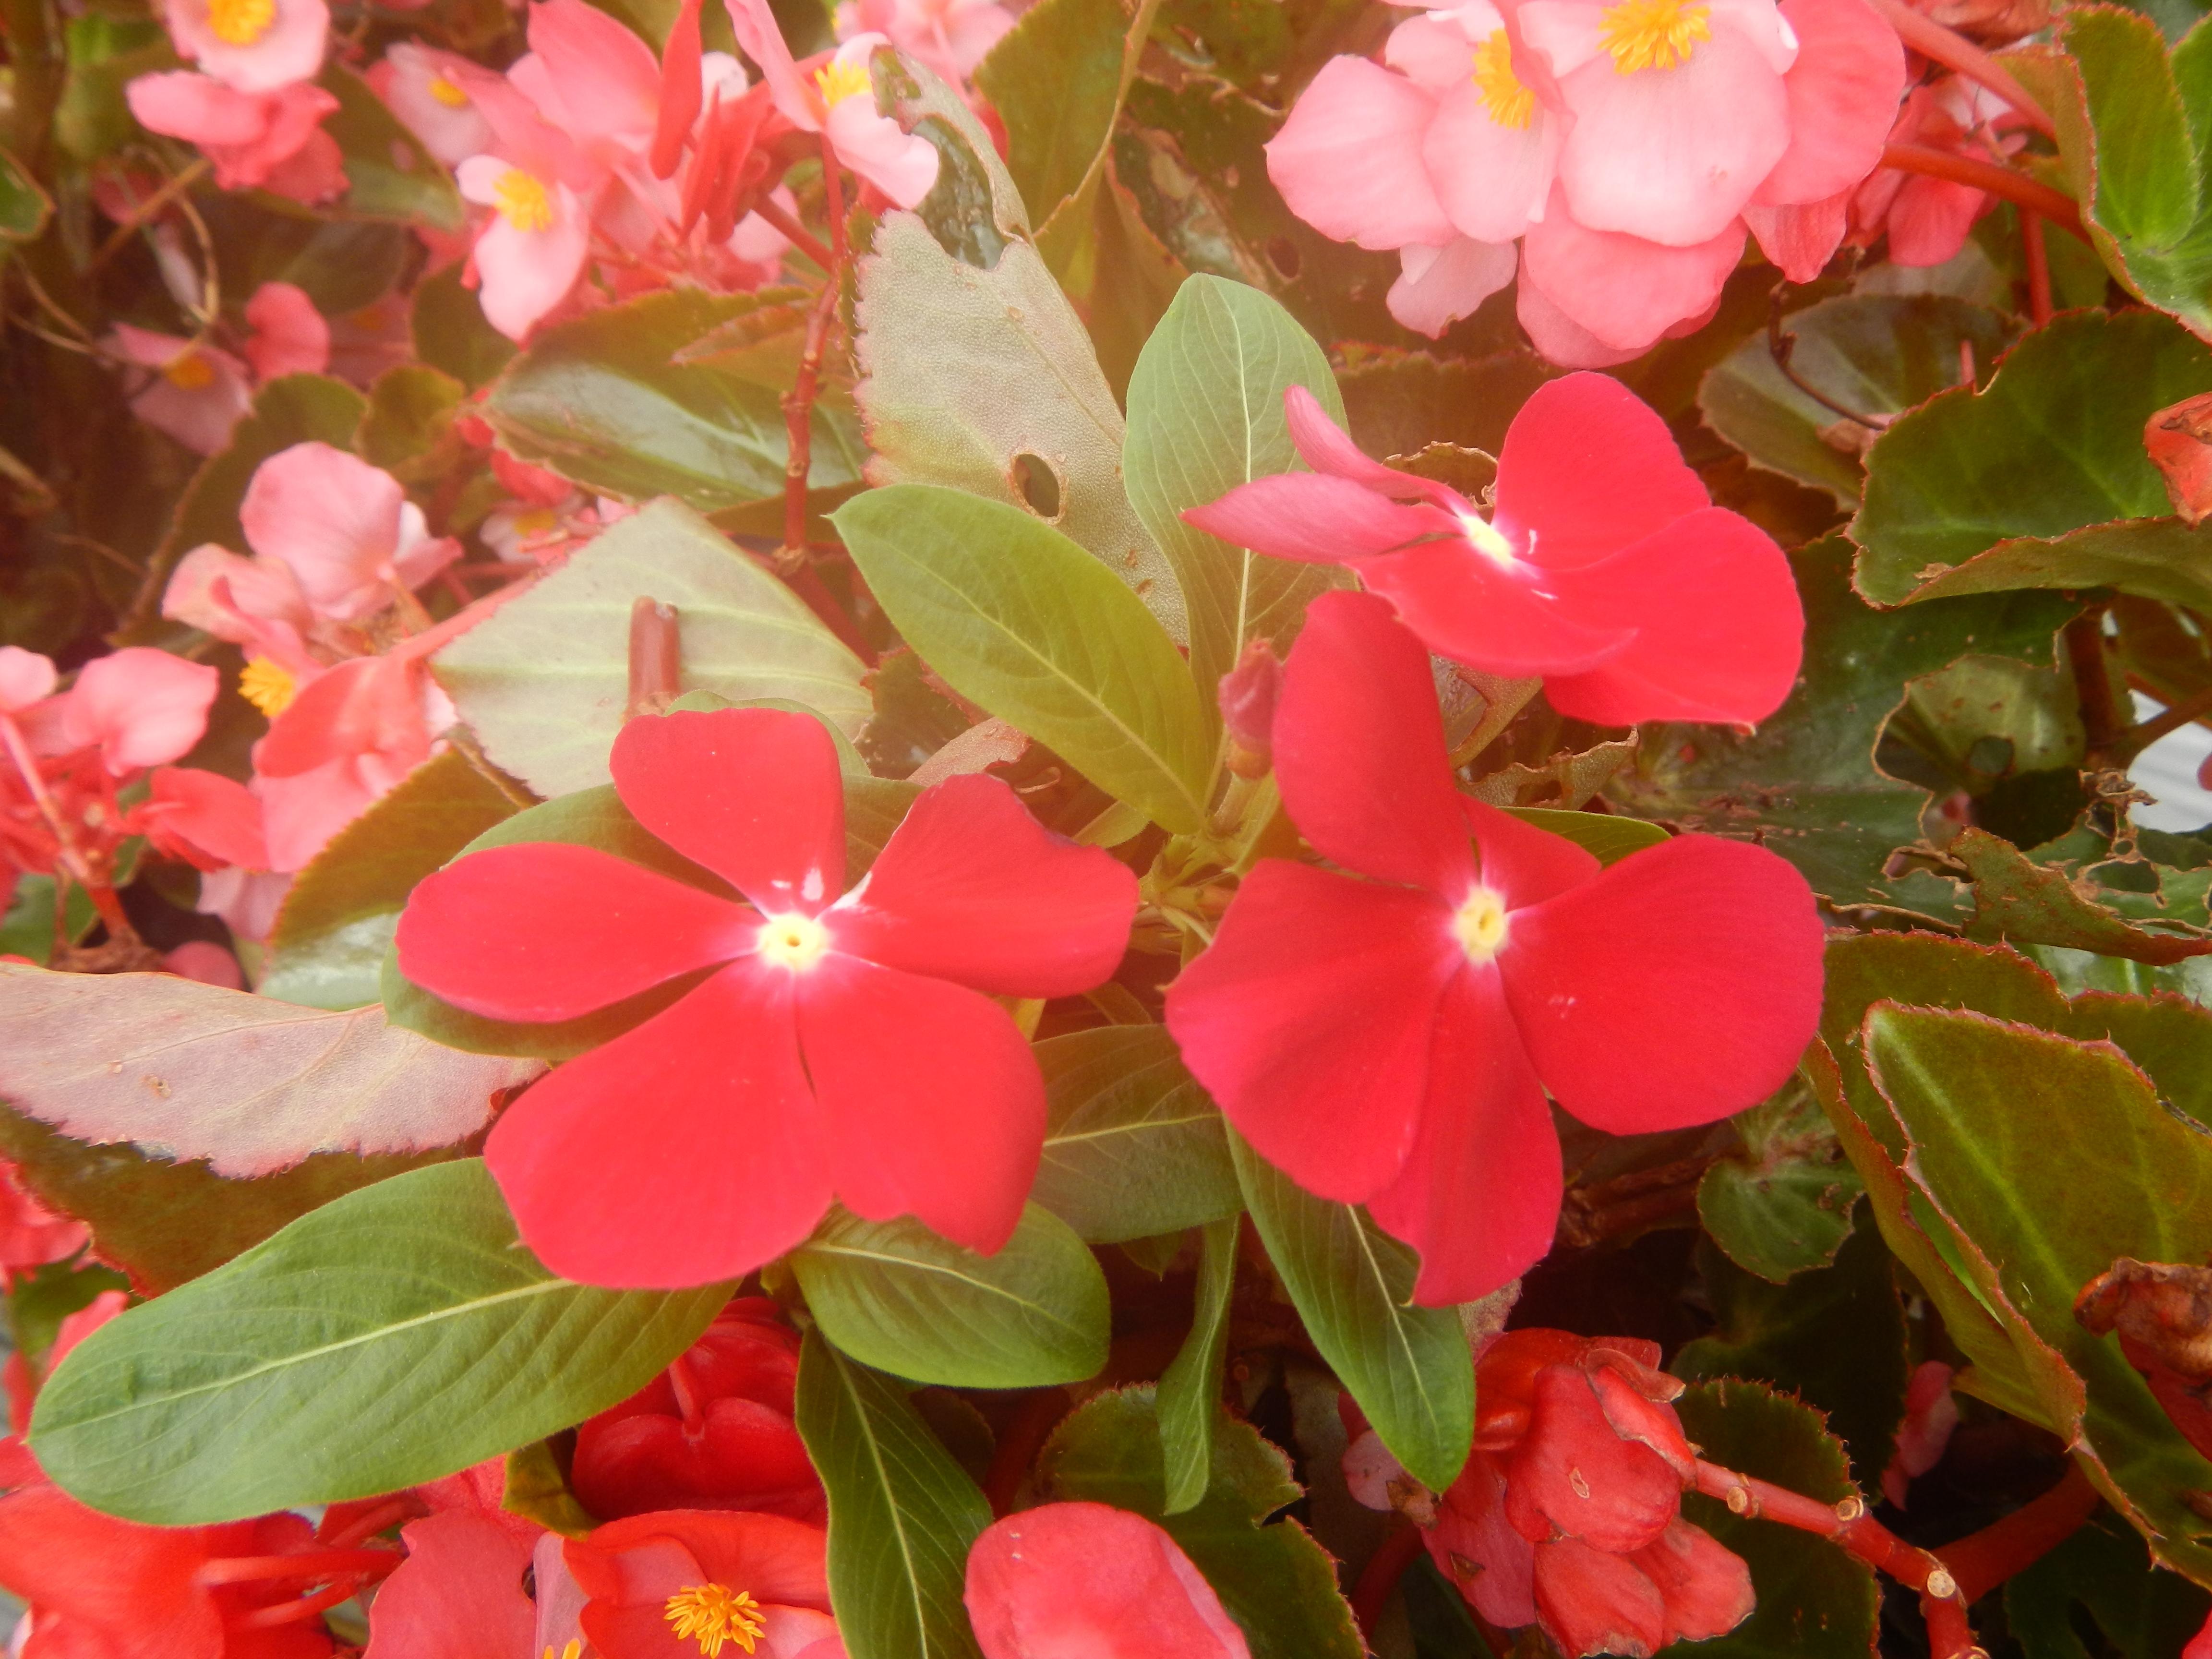 File02058jfclose Ups Of Vinca Flowers Pacifica Mixedfvf 08g